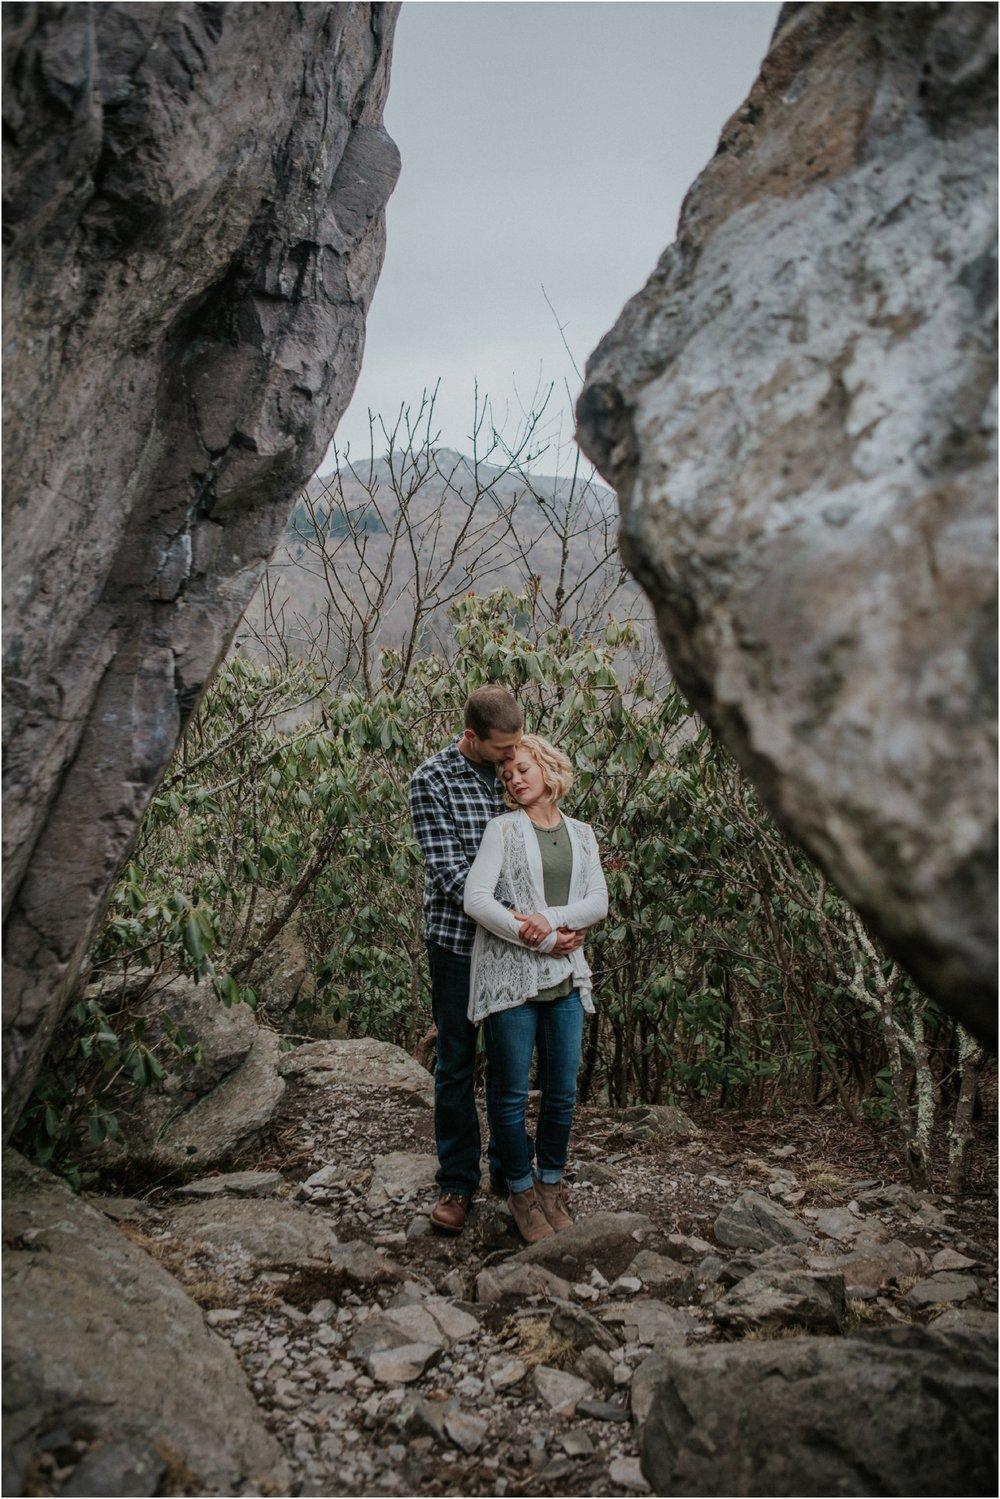 grayson-highlands-engagement-session-foggy-mountain-rustic-appalachian-virginia-katy-sergent-photography_0017.jpg